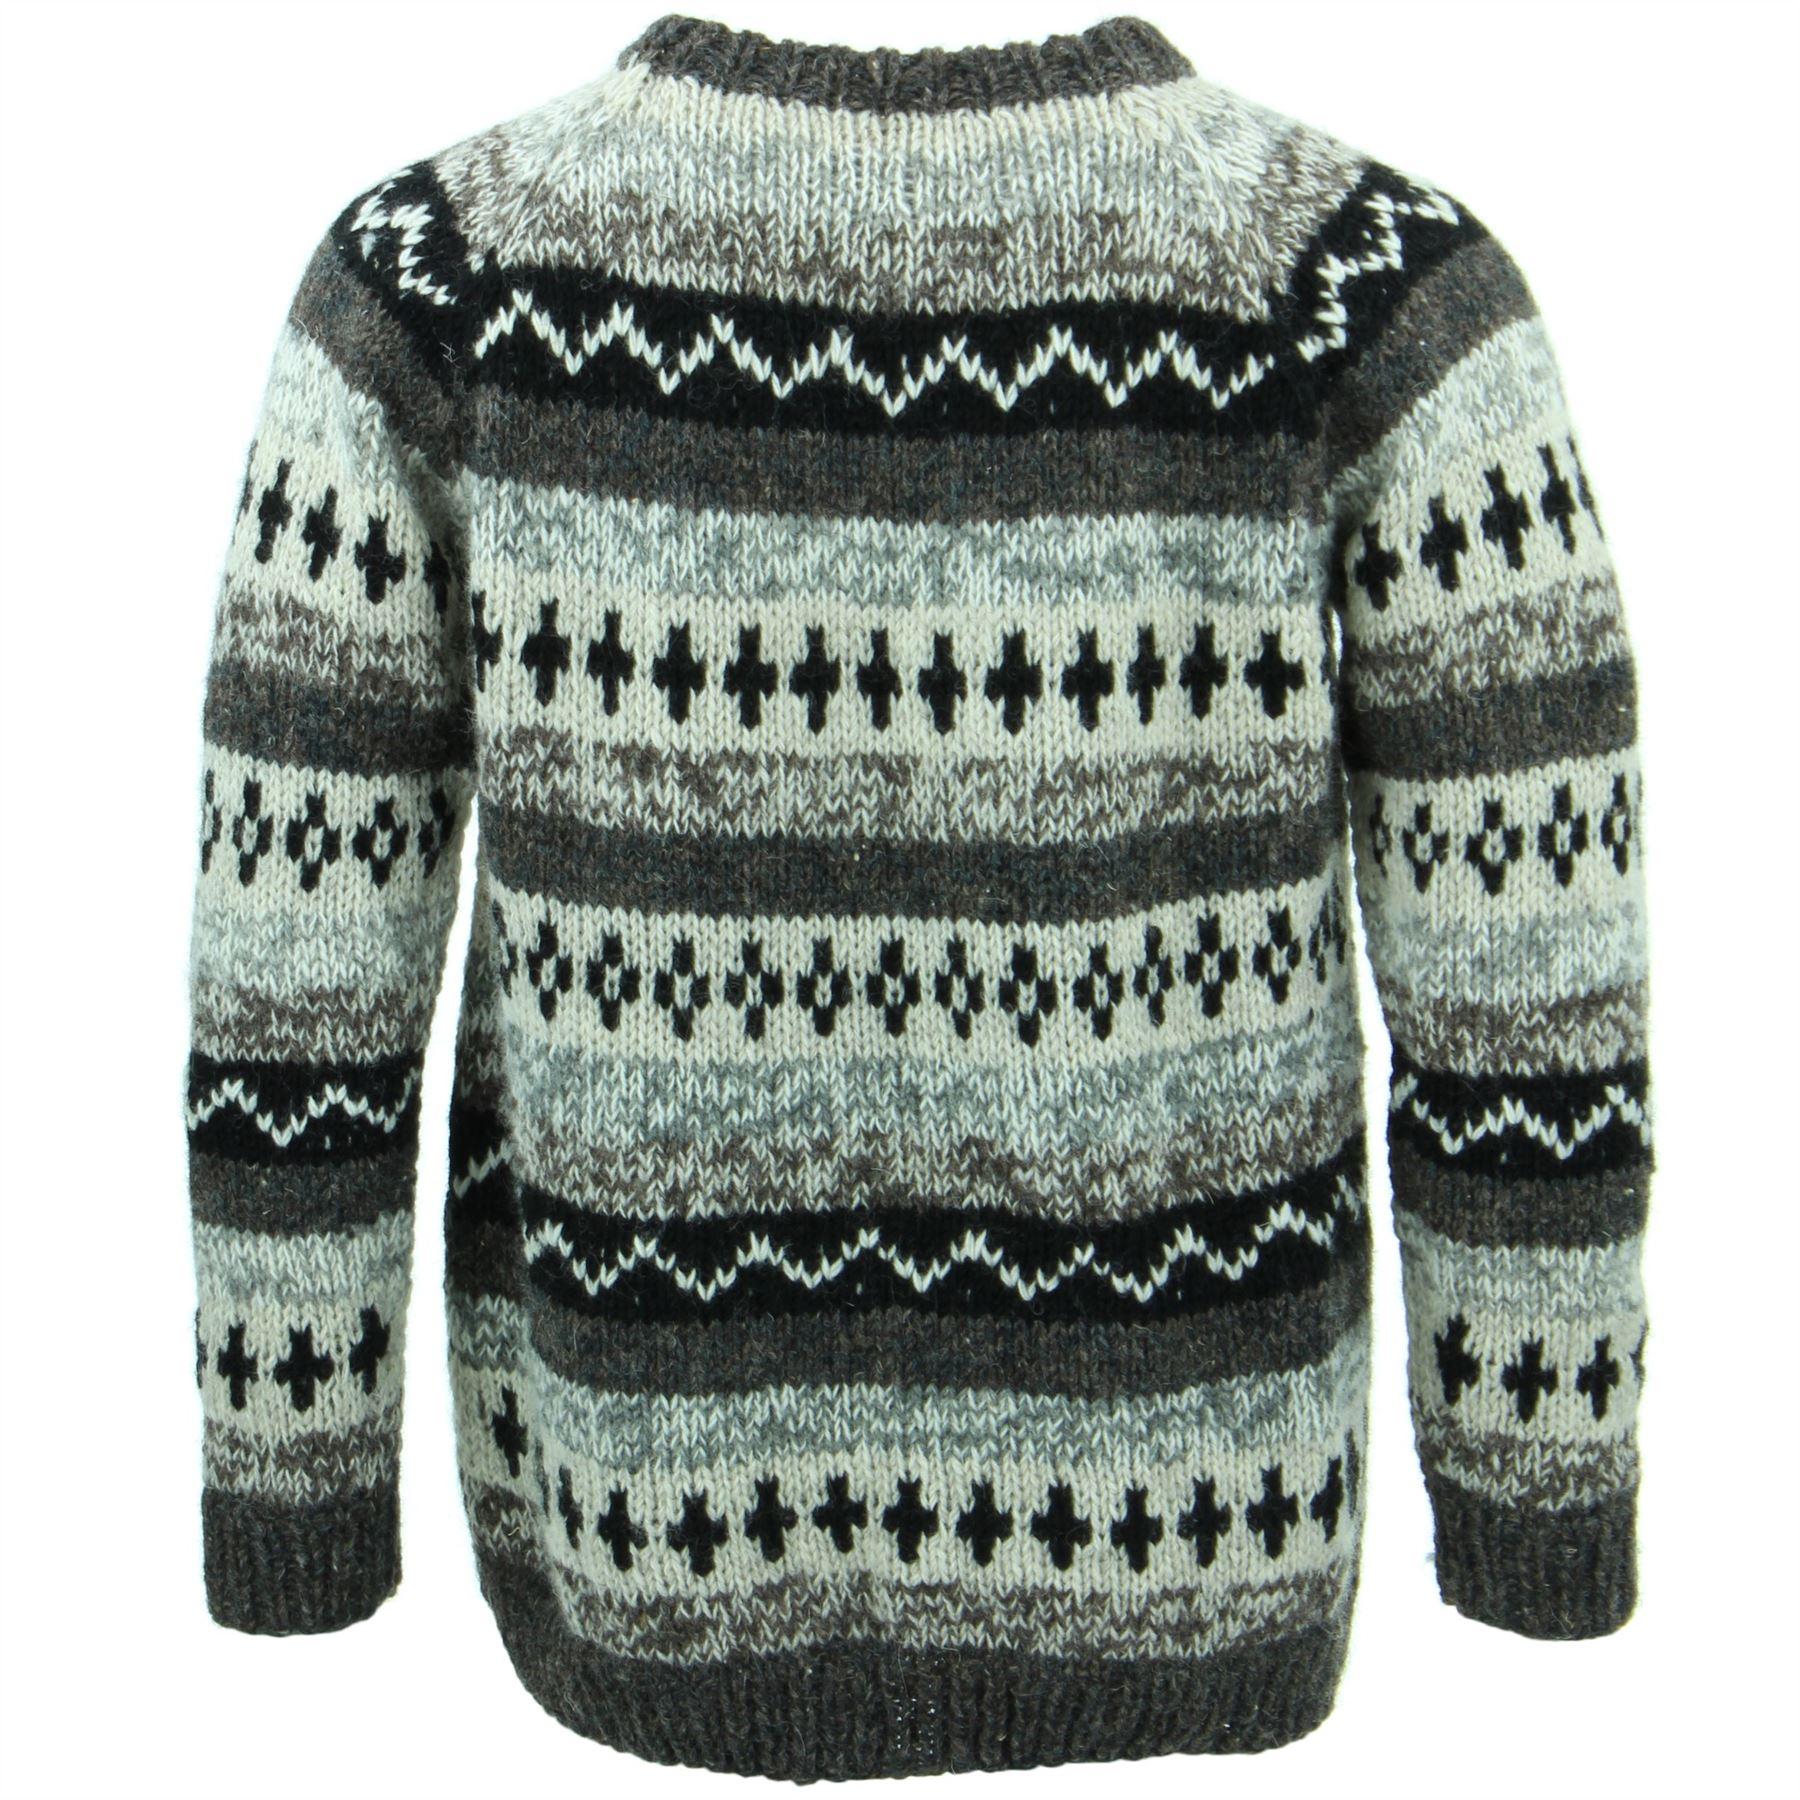 thumbnail 13 - Wool Knit Jumper Sweater Pullover Fairisle Nordic Abstract Warm Nepal Loose